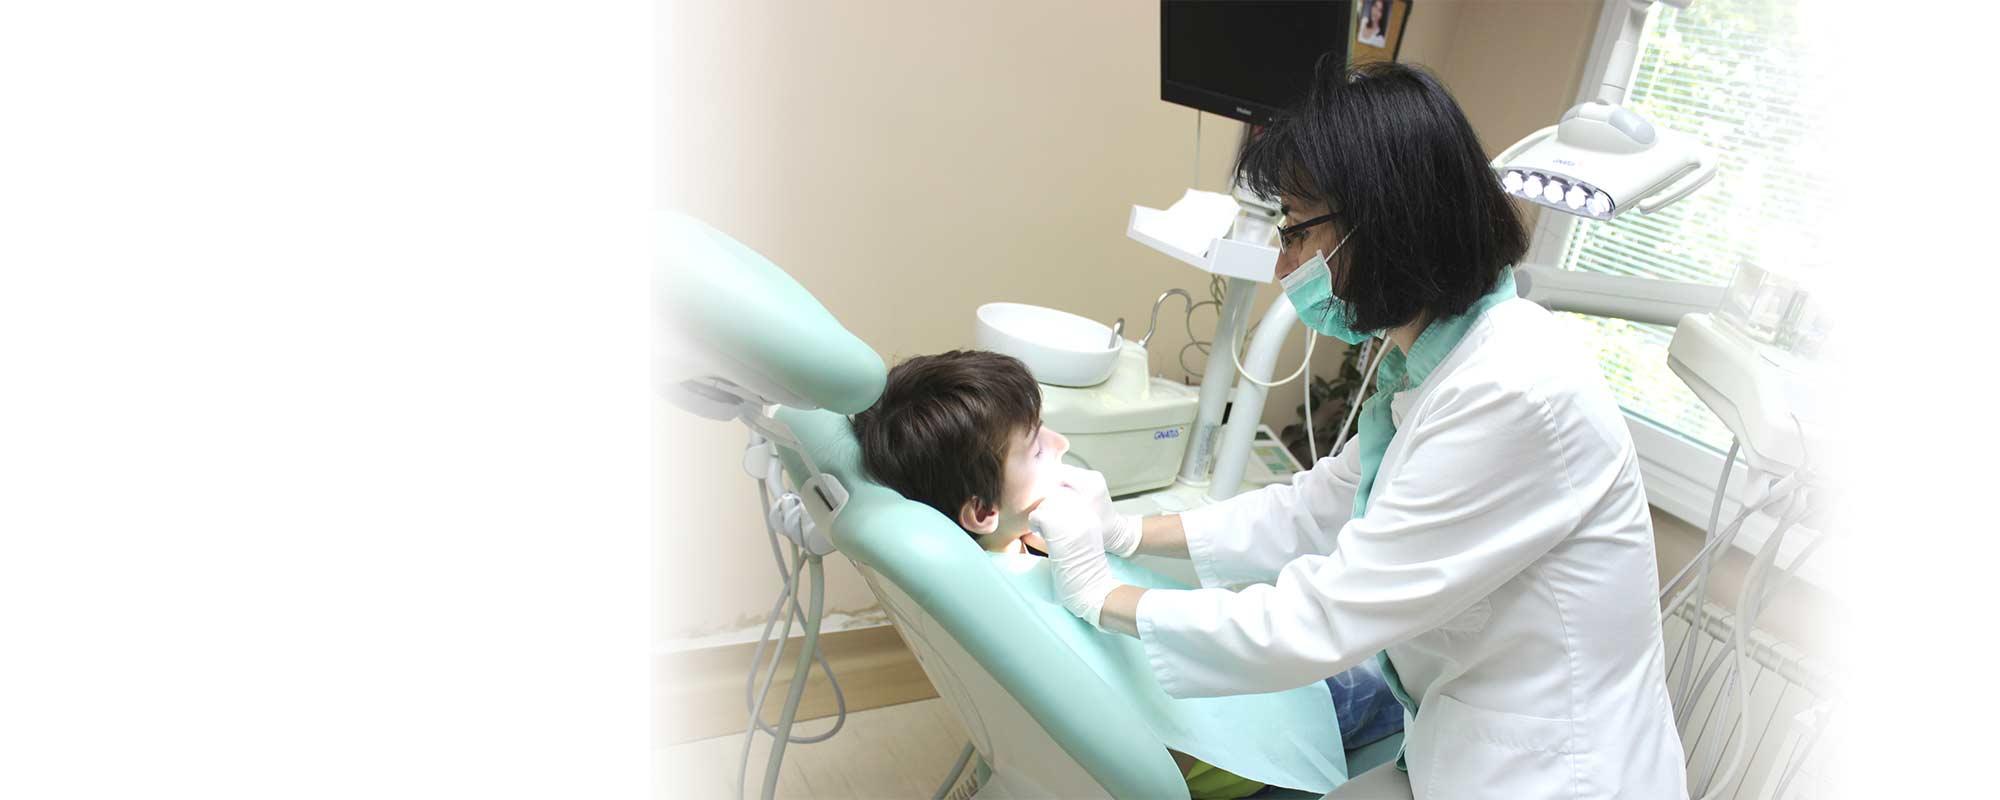 40 ГОДИНИ Стоматолошка Поликлиника Ѓорѓиоски